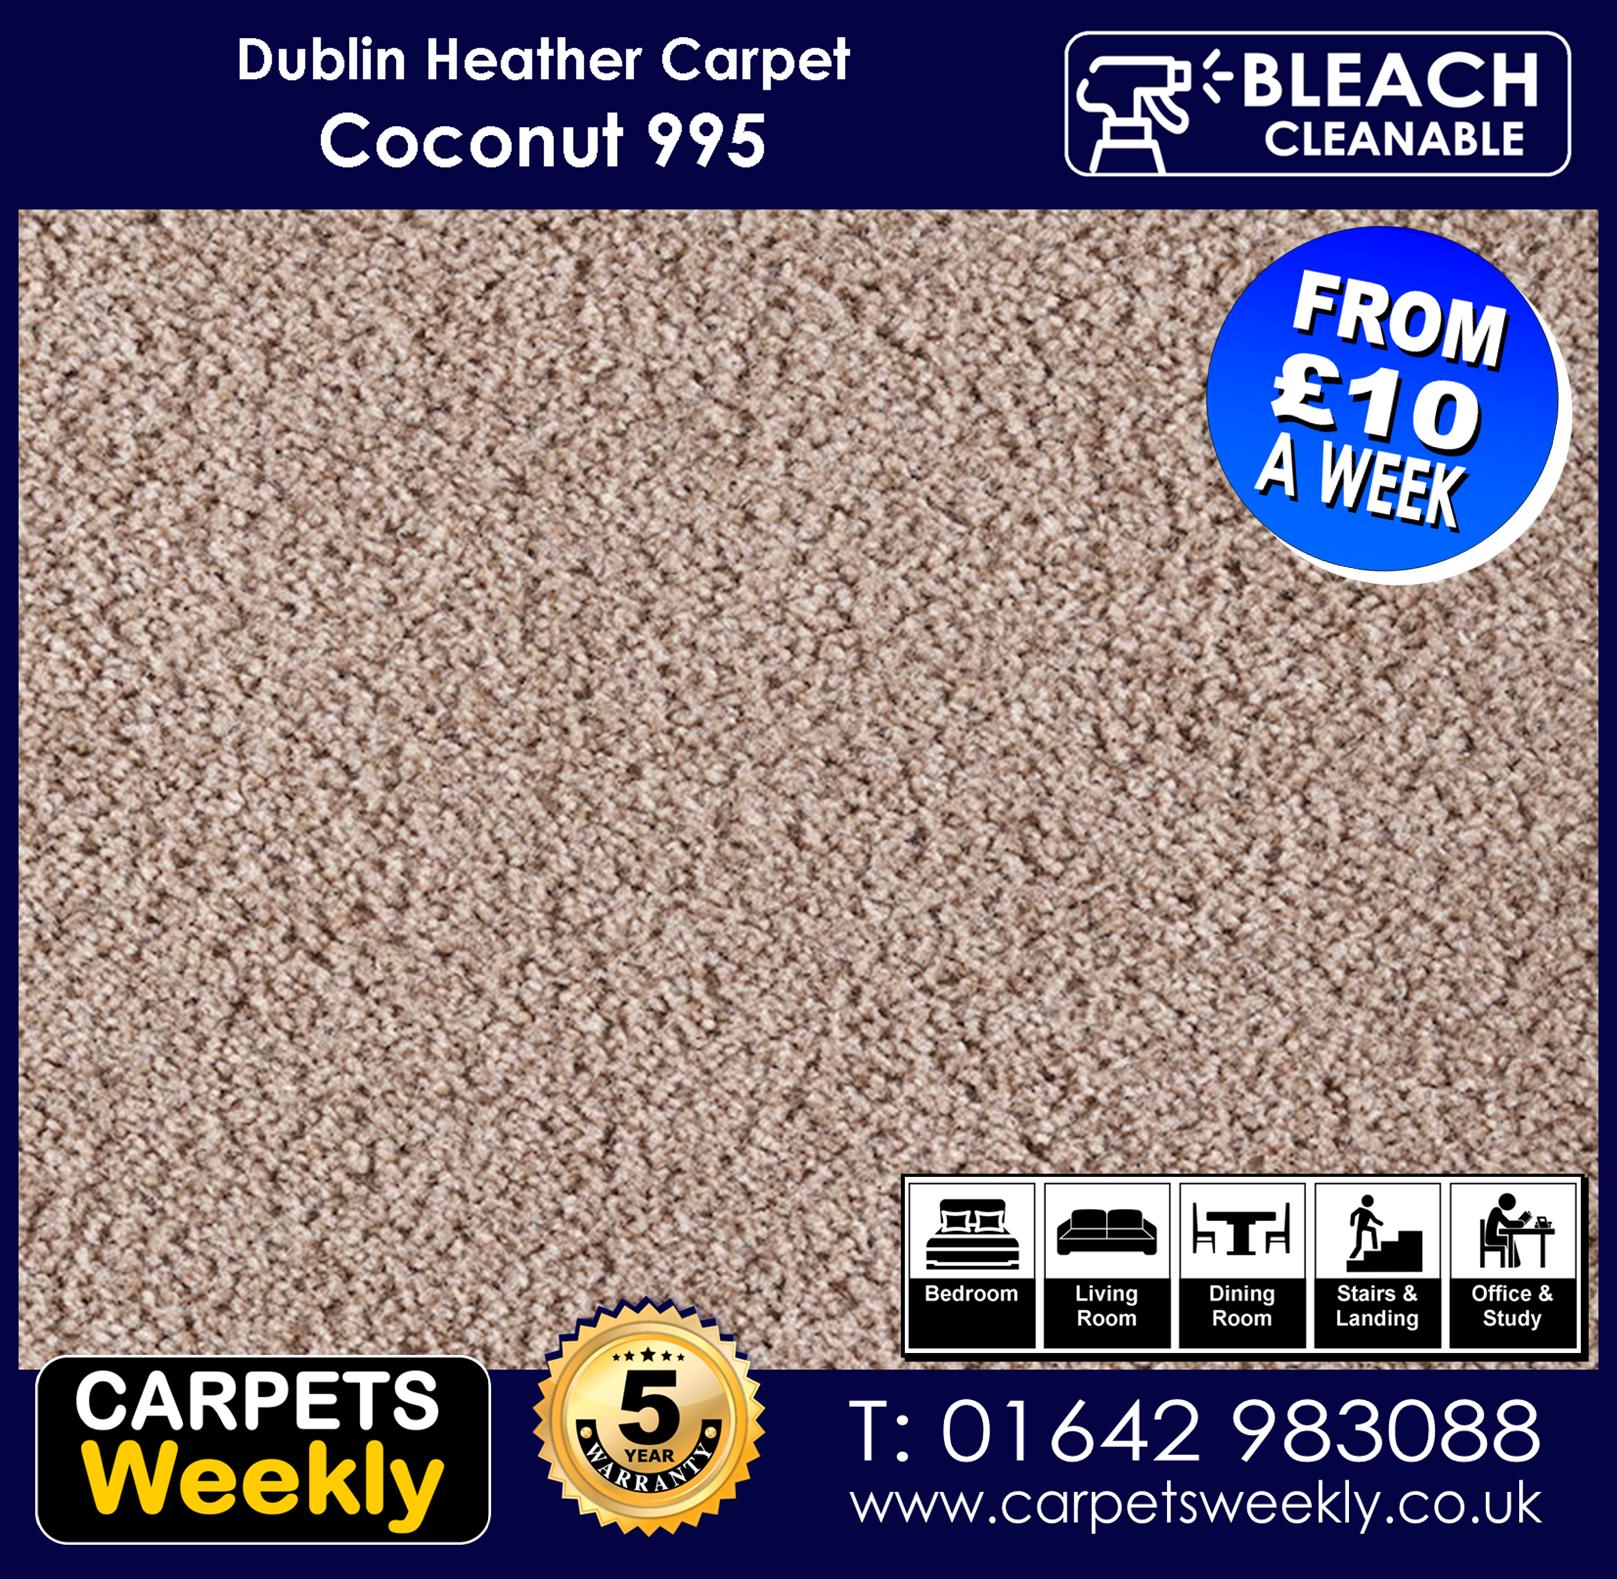 Carpets Weekly Dublin Heather Coconut 995  mid range carpet